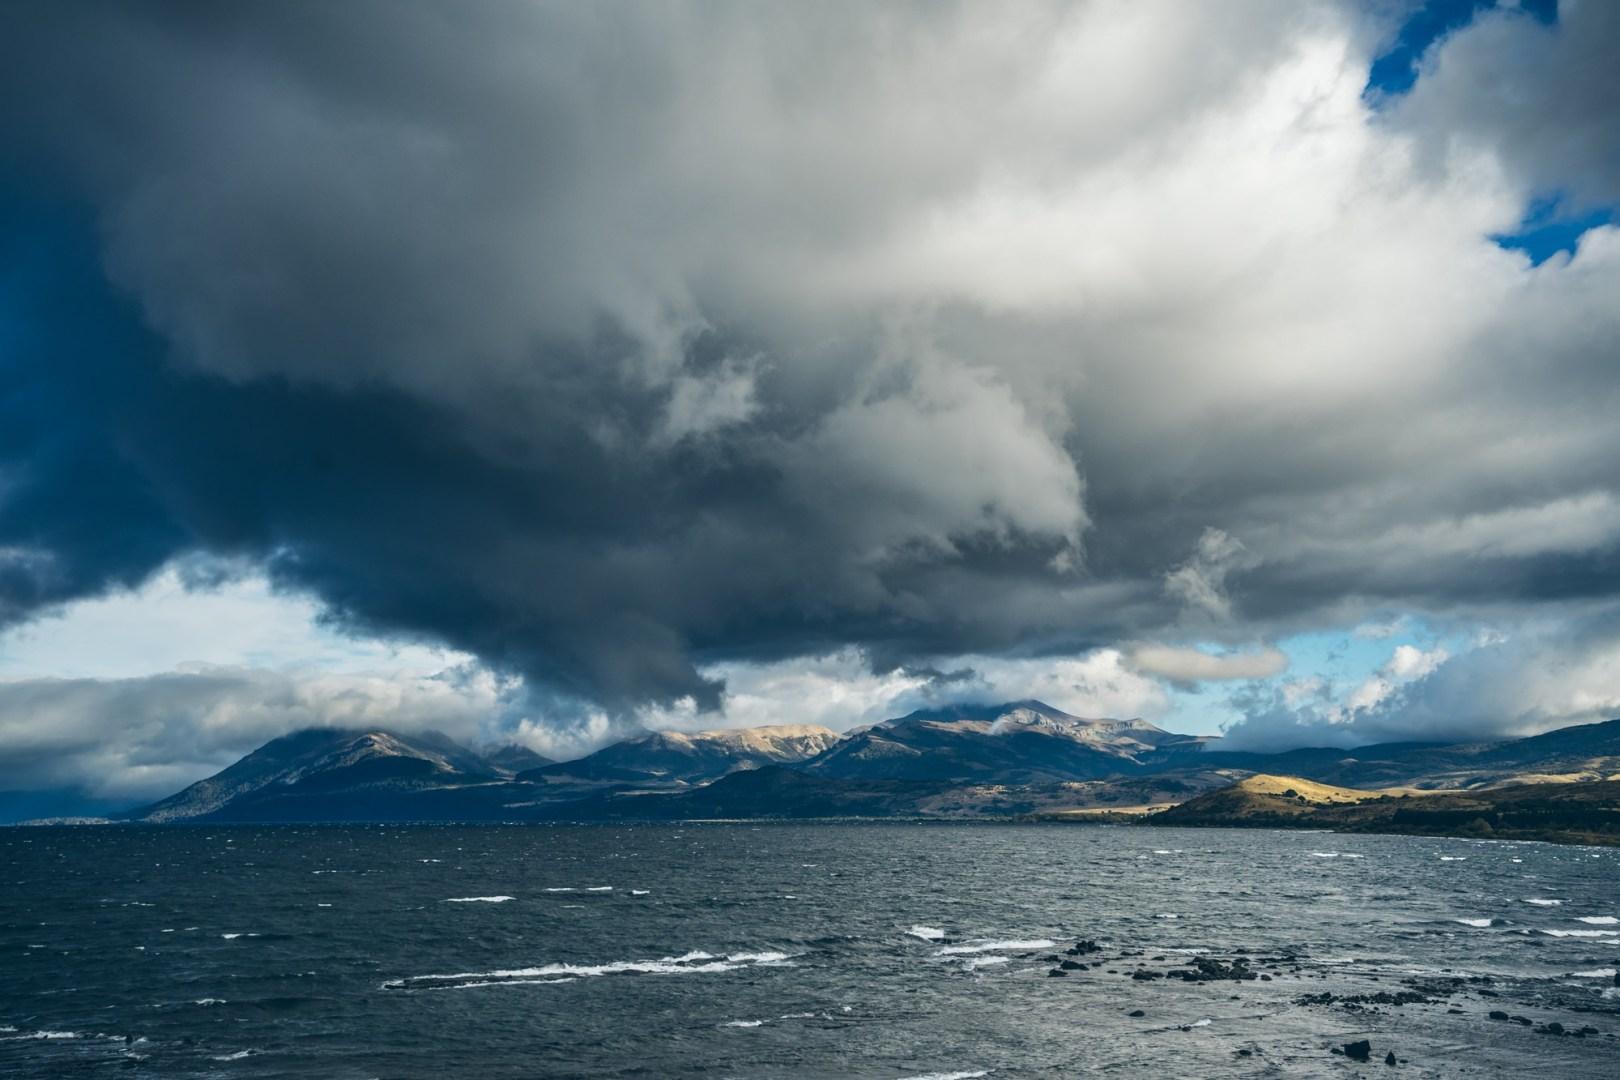 Lago Huechulafquen avec le volcan Lanin